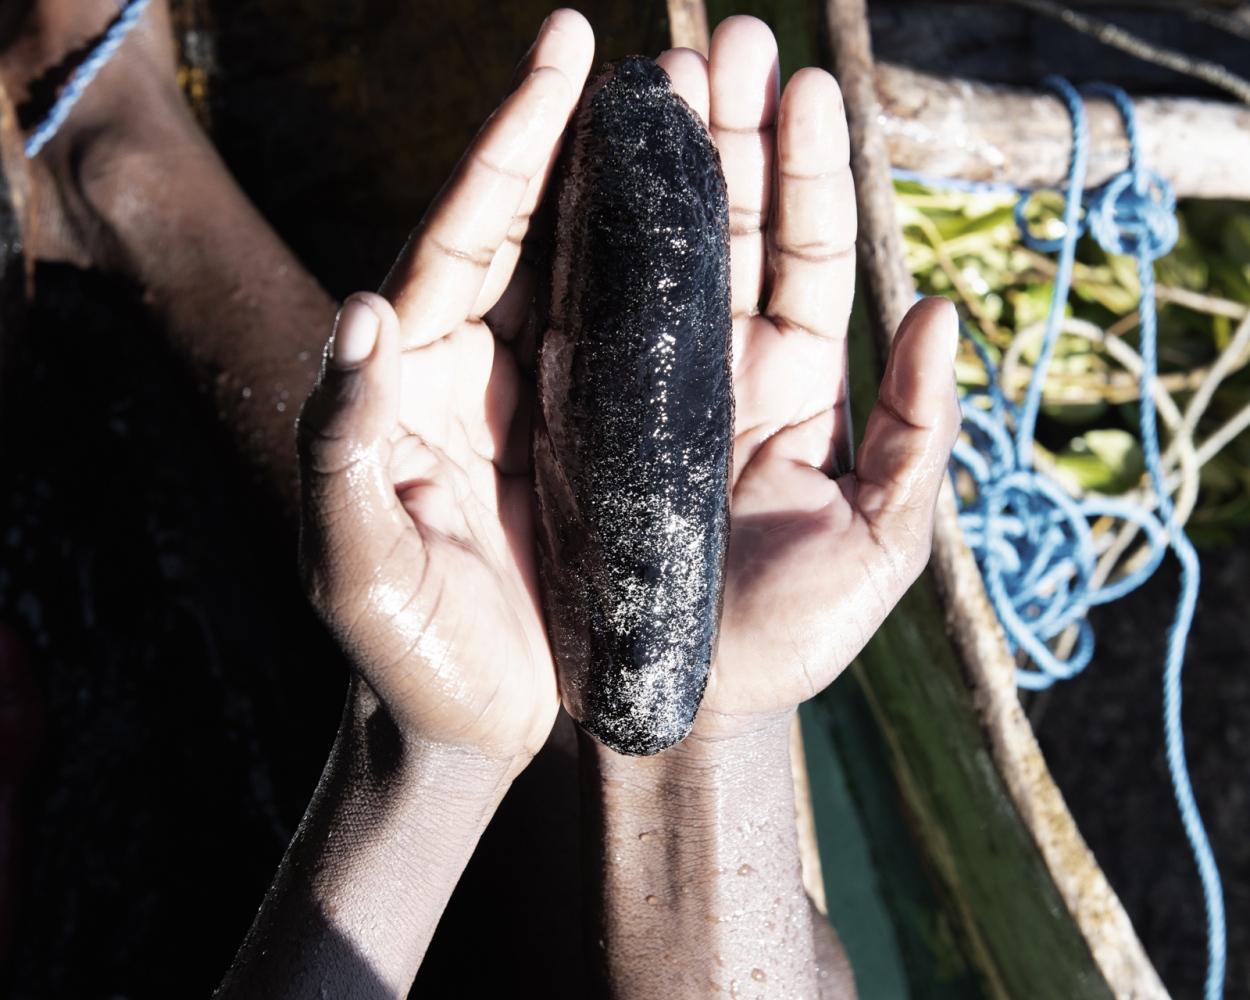 A diver shows a Sea Cucumber he caught.